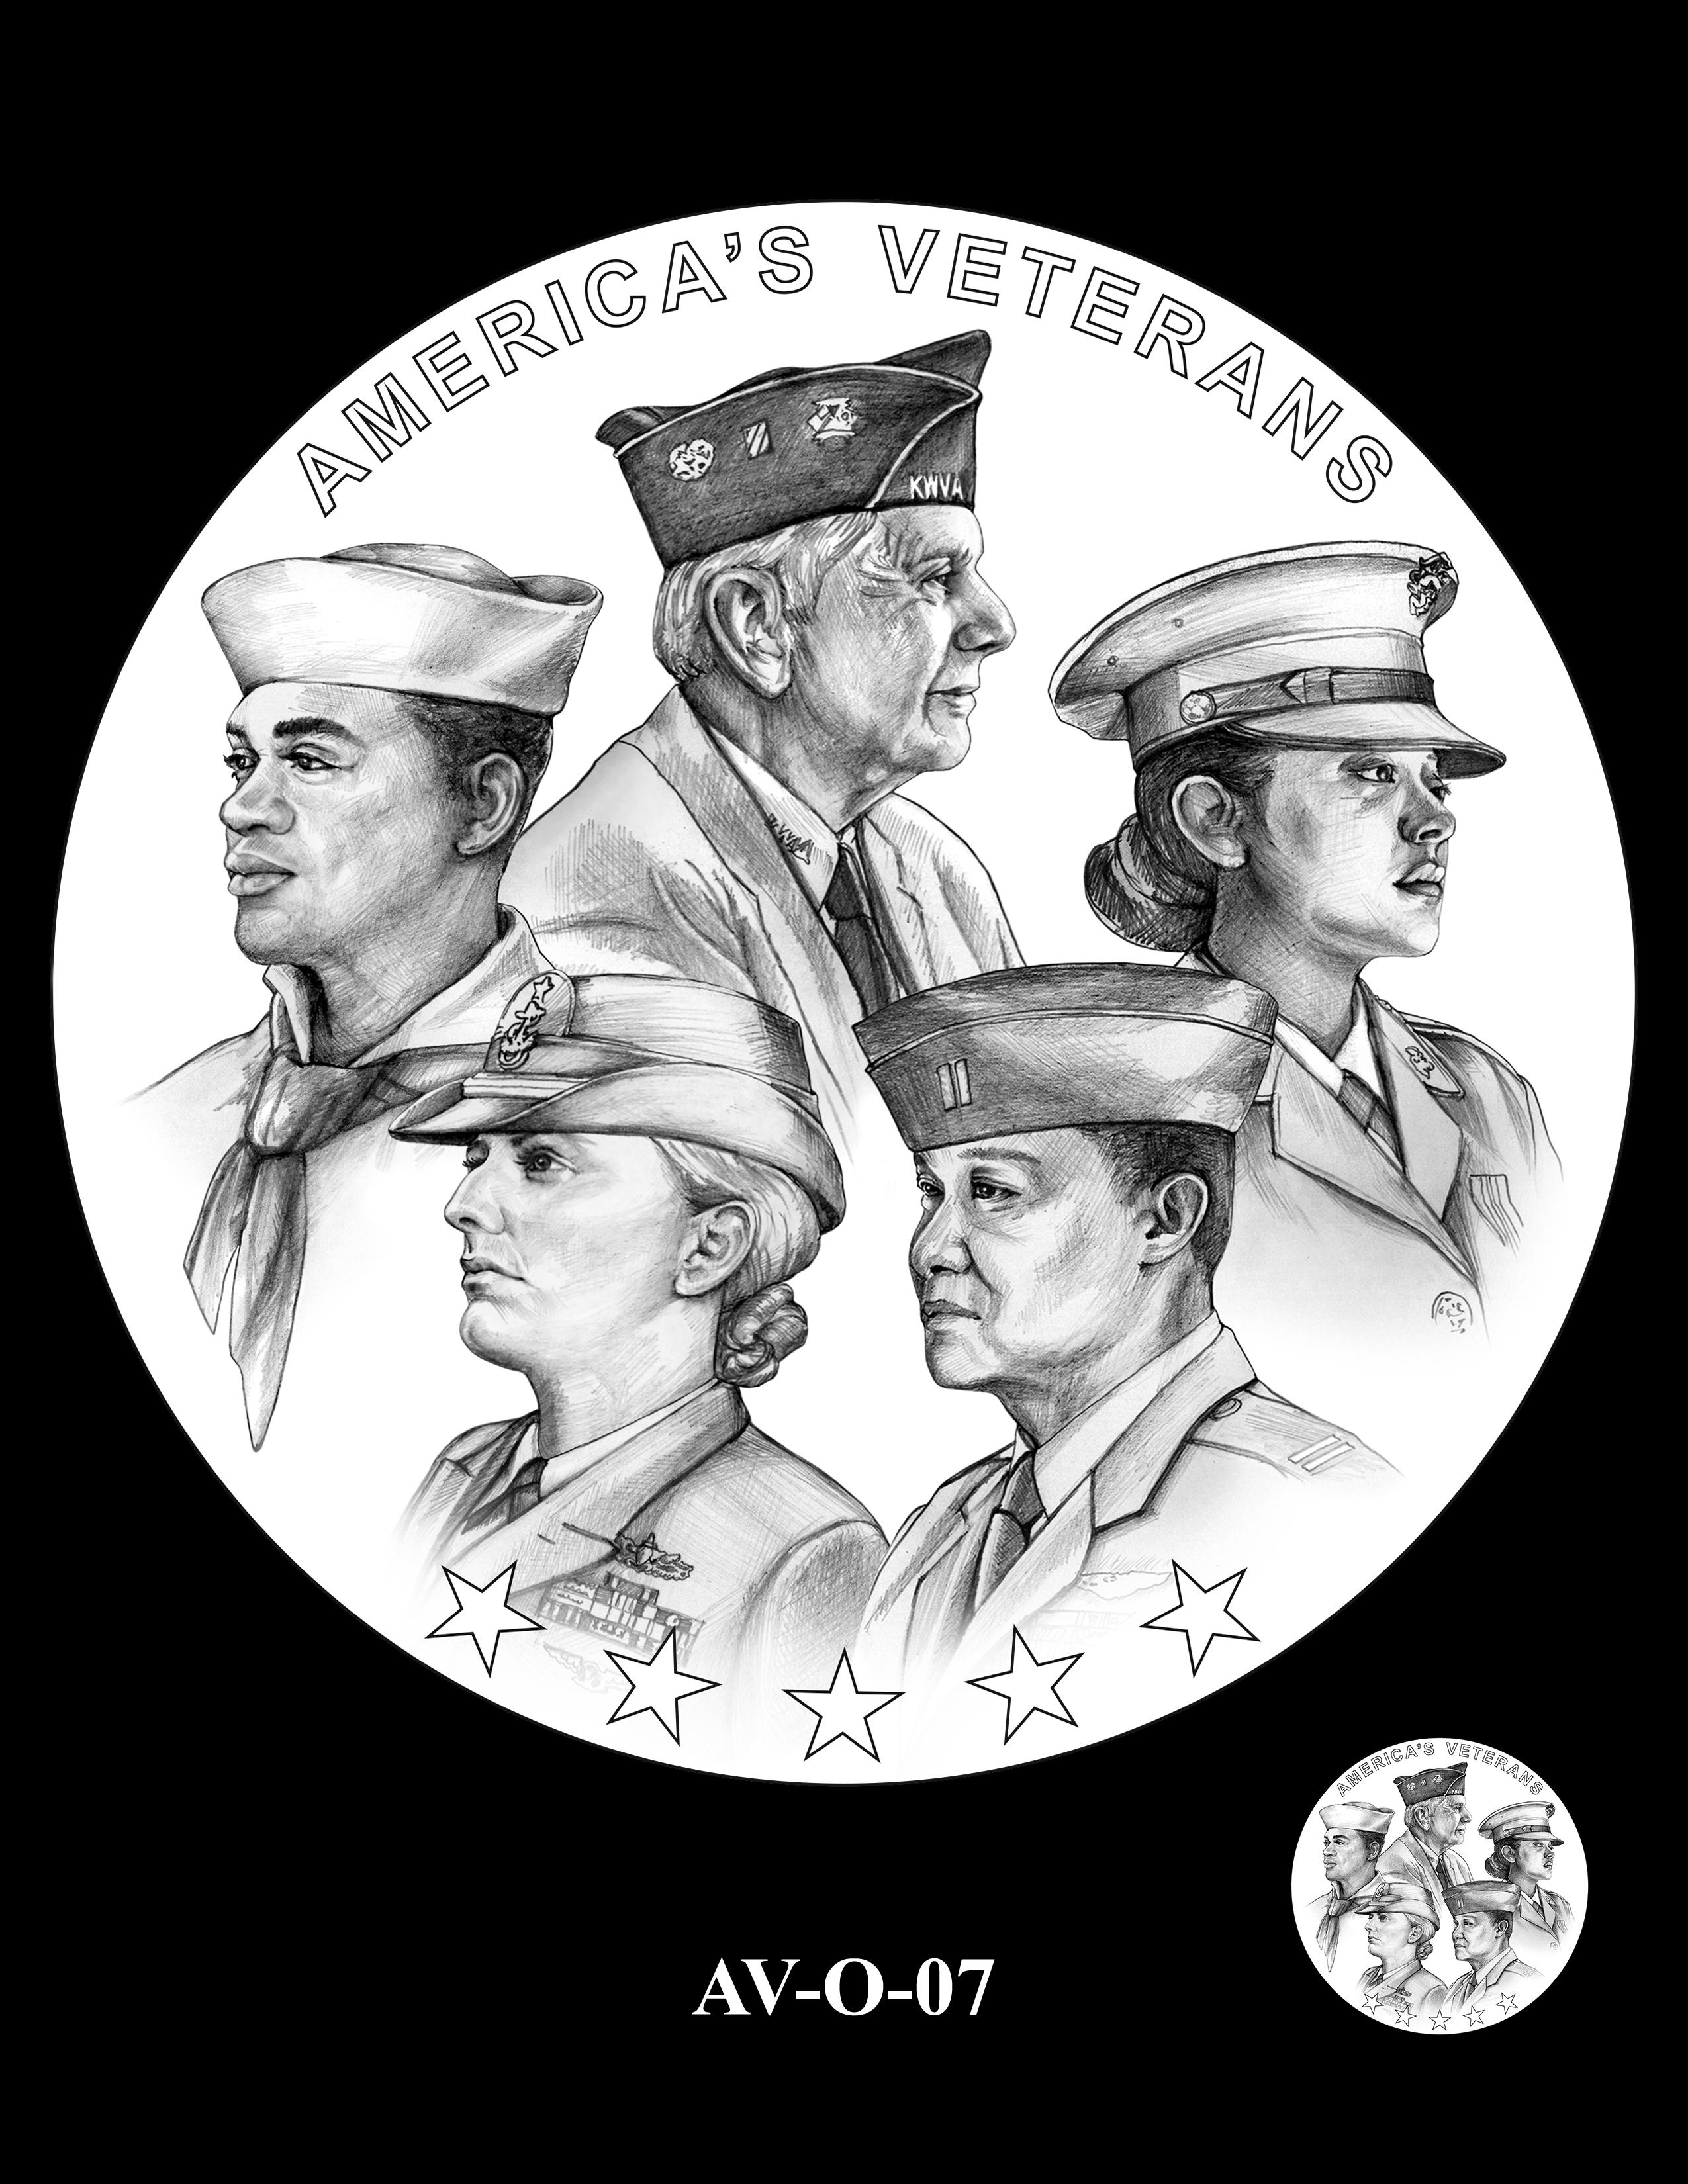 AV-O-07 - American Veterans Medal